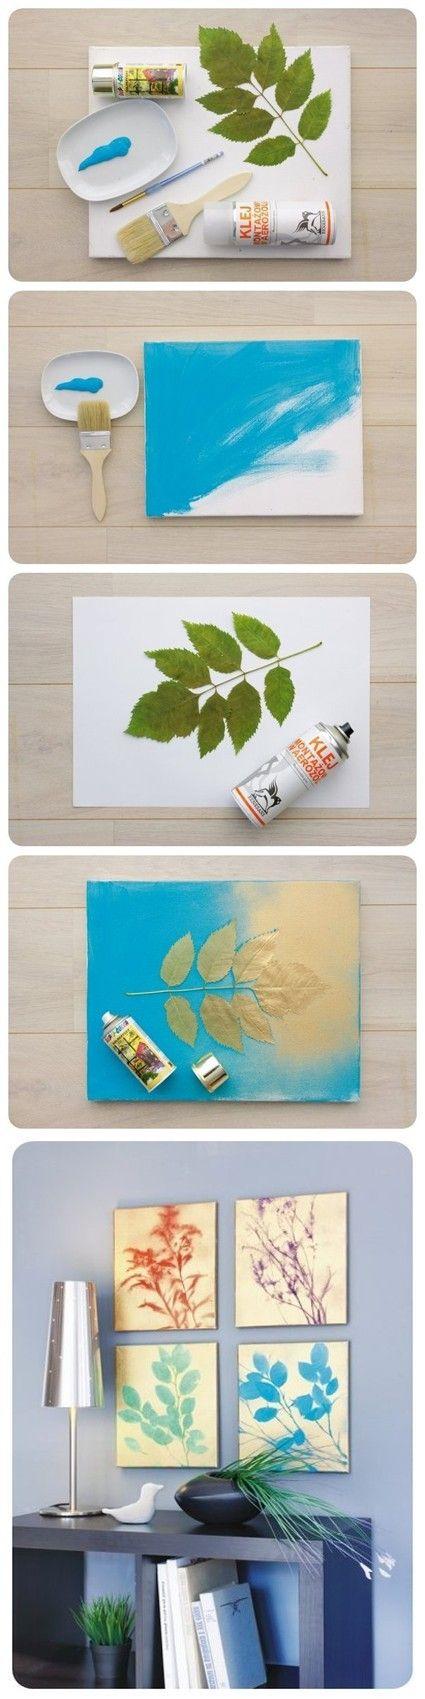 DIY  ::  Spray paint plant pictures